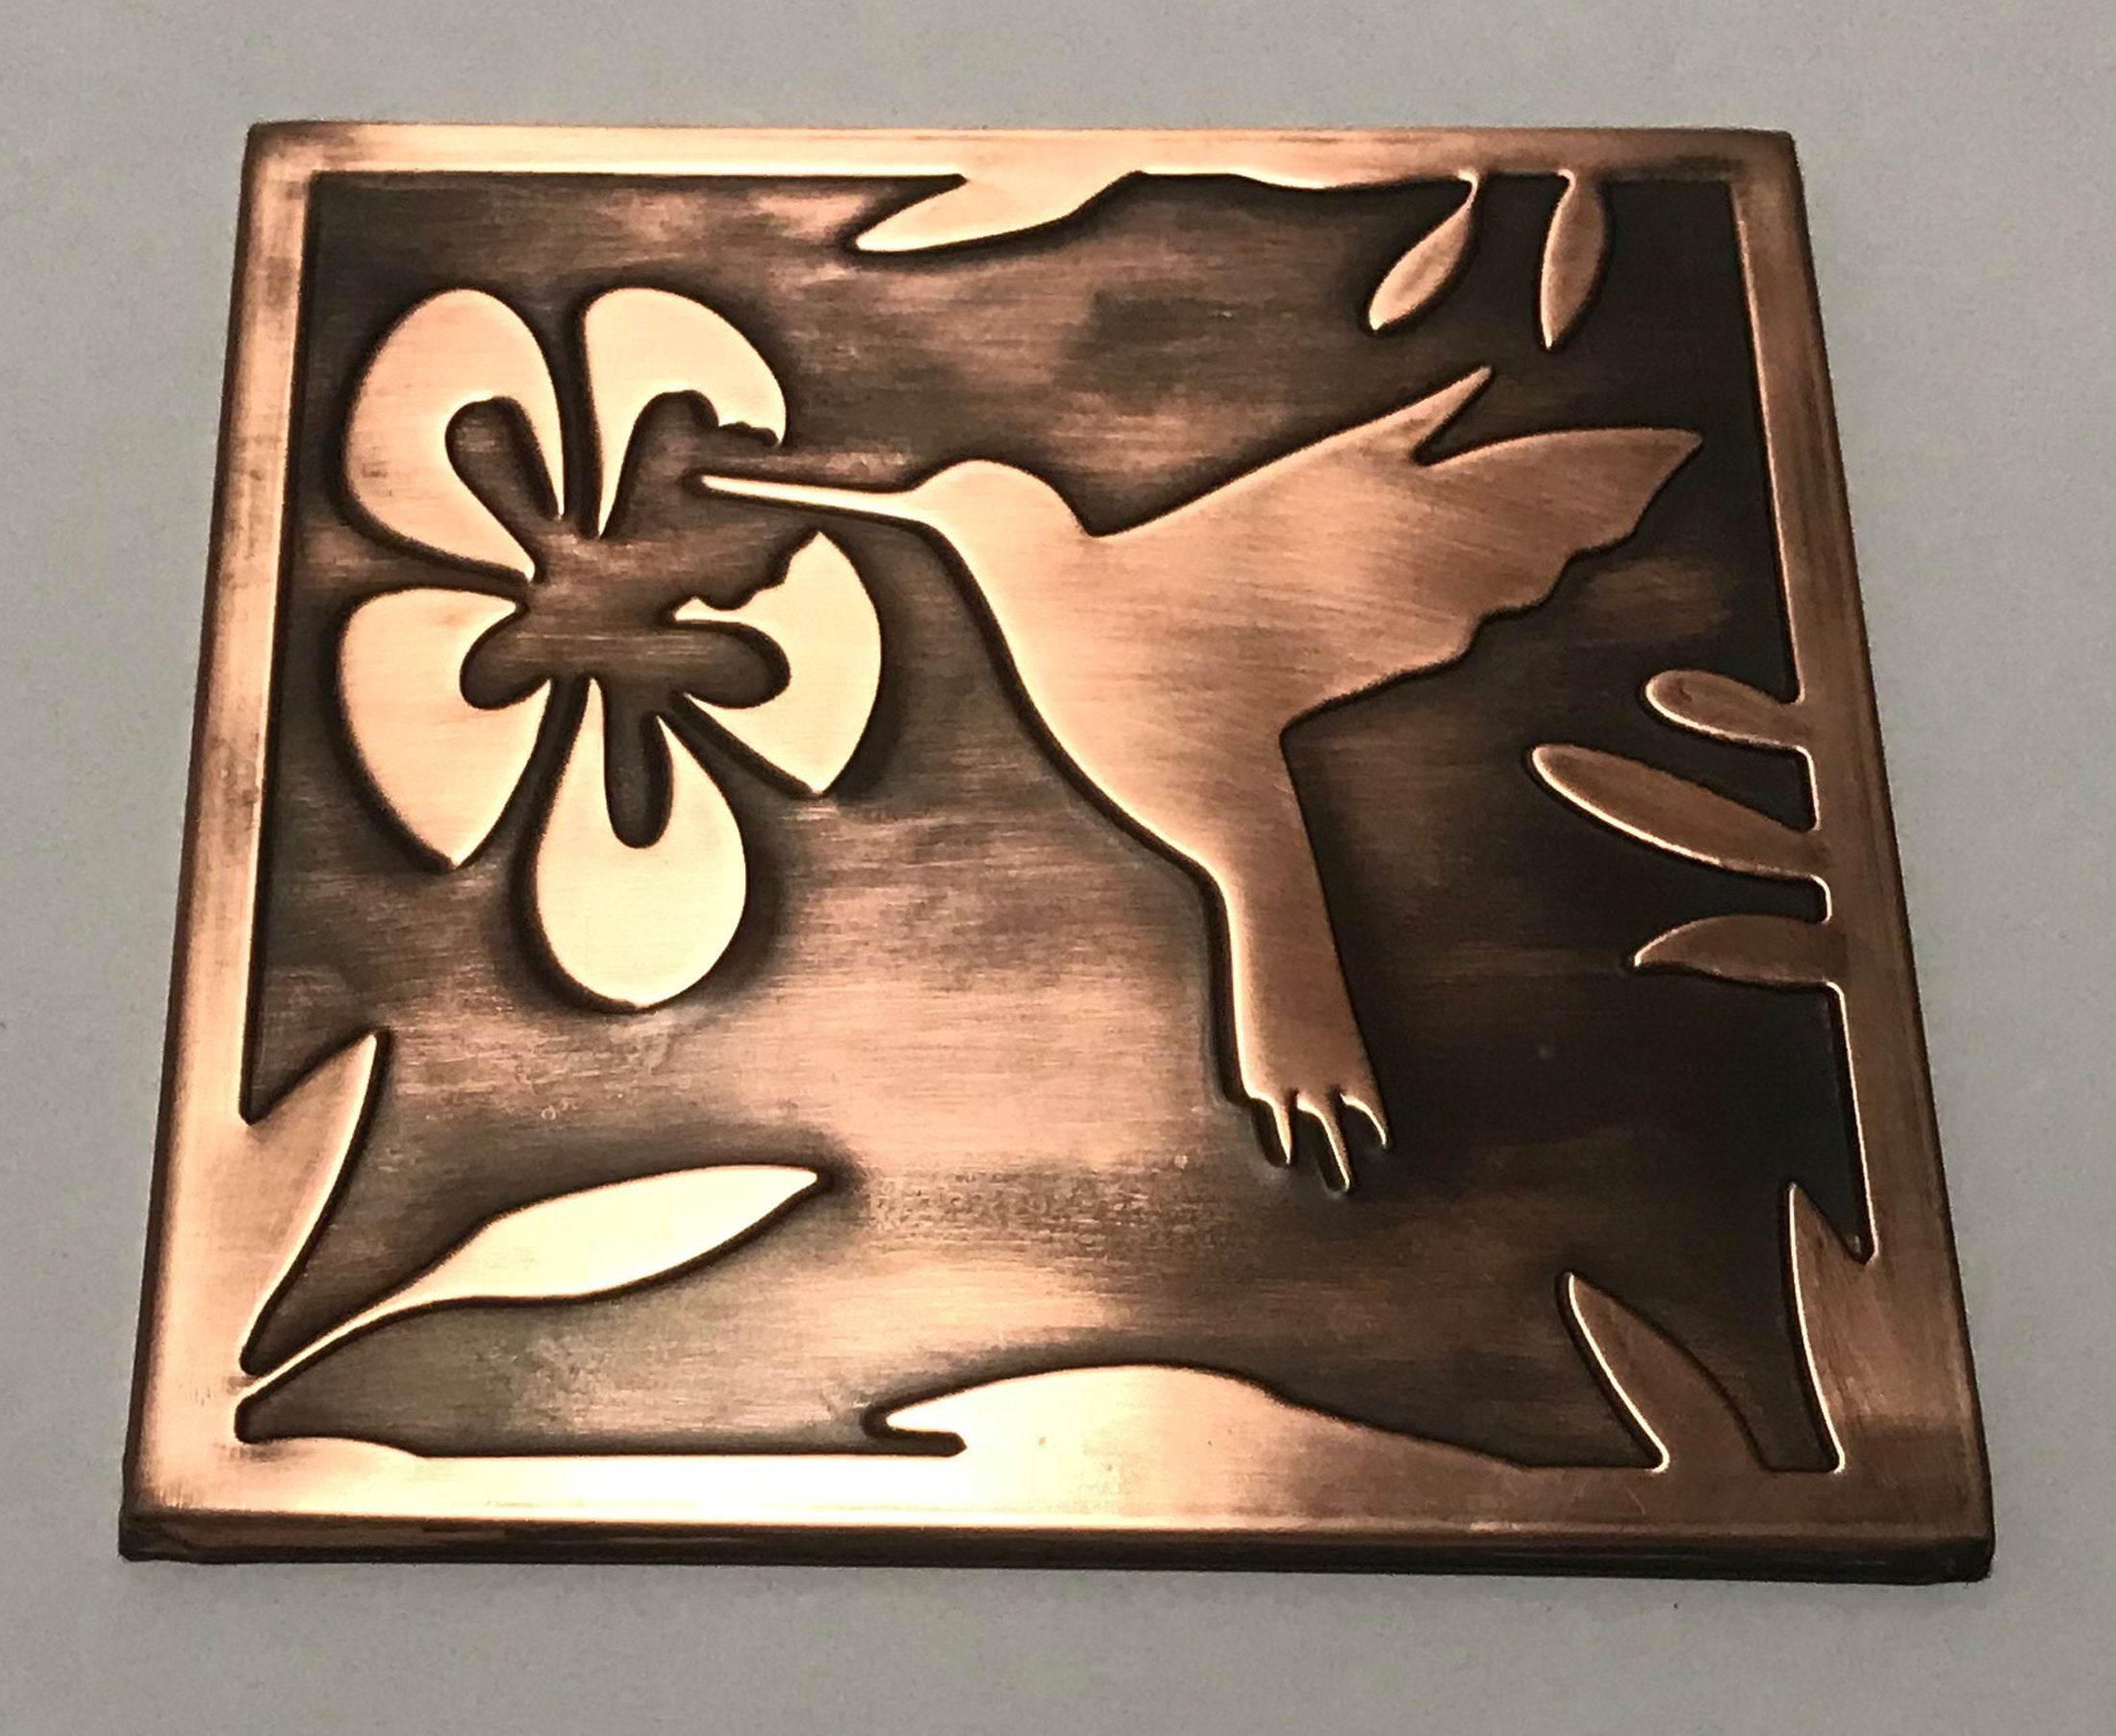 - Hummingbird, 100% Copper Tile, Metal Wall Art, Wall Tile, Kitchen